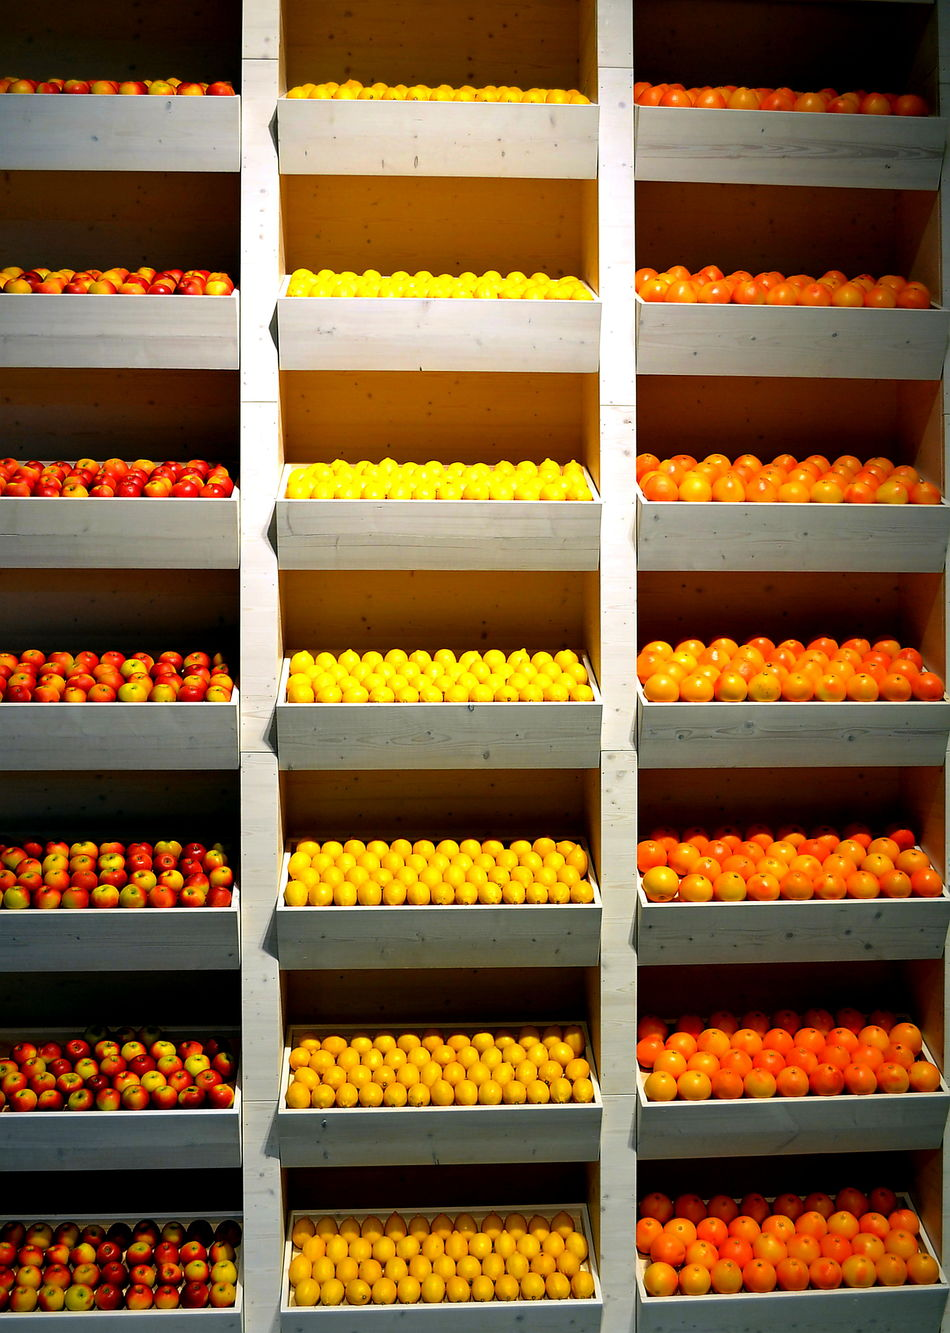 Beautifully Organized Fruits Yellow Food Colour Of Life No People Freshness Regale Regale Orange Zitrone Lemon Apple Shelves